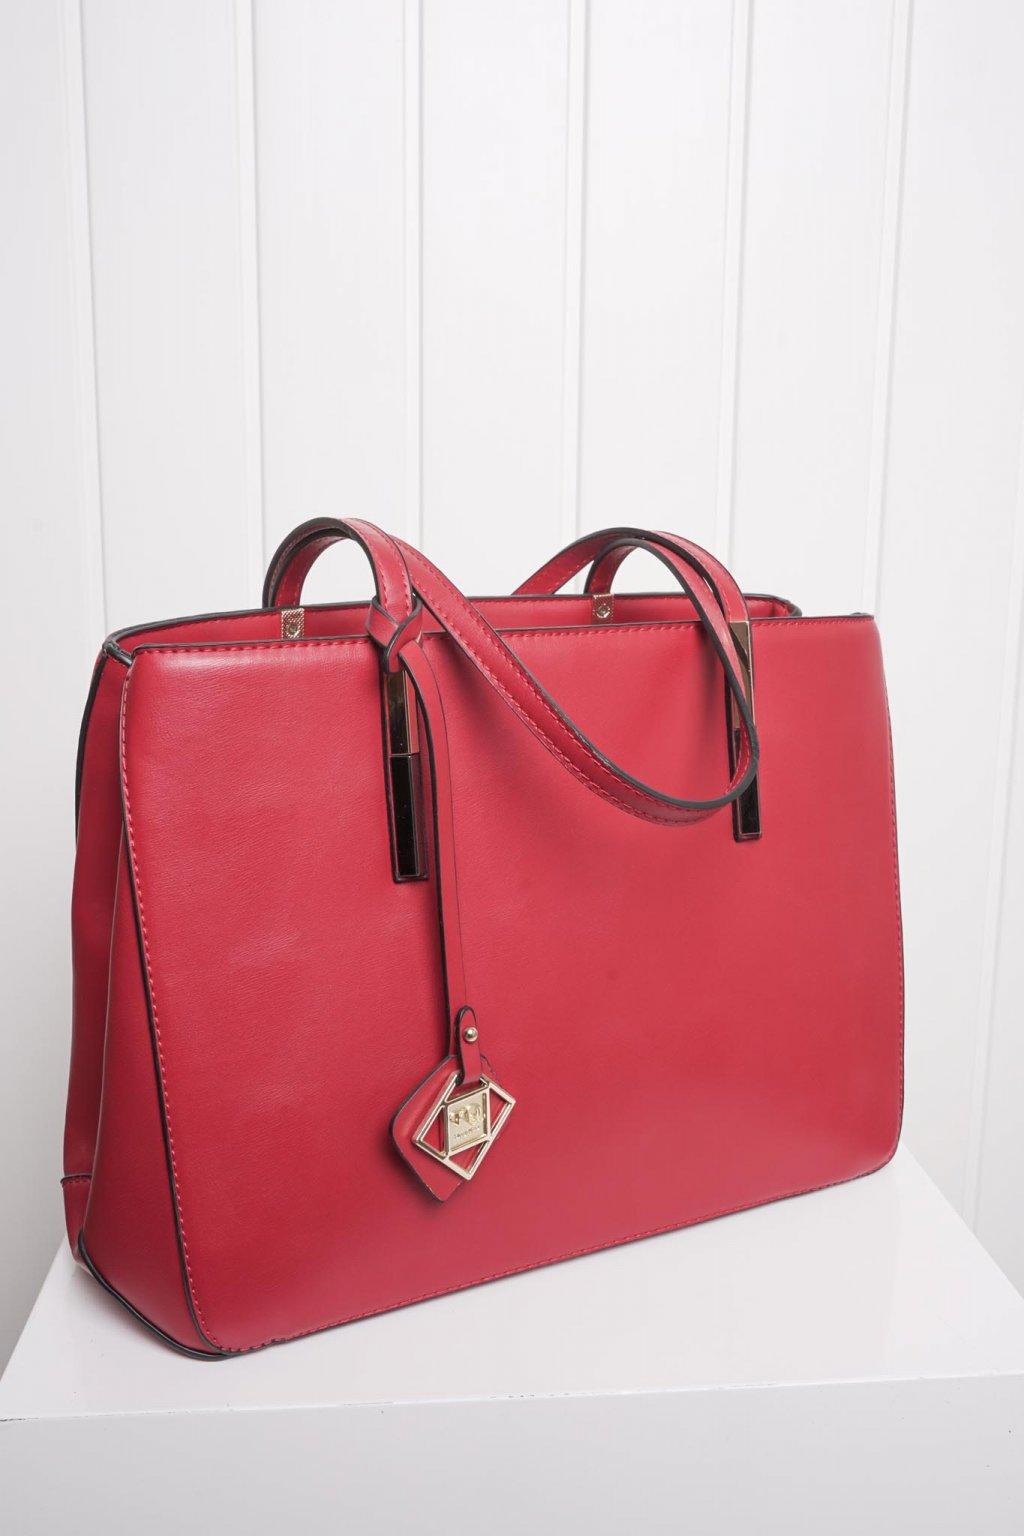 Kabelka, ruksak, dobrá cena, čierna kabelka, čierny ruksak, basic, kabelky, ruksaky 112